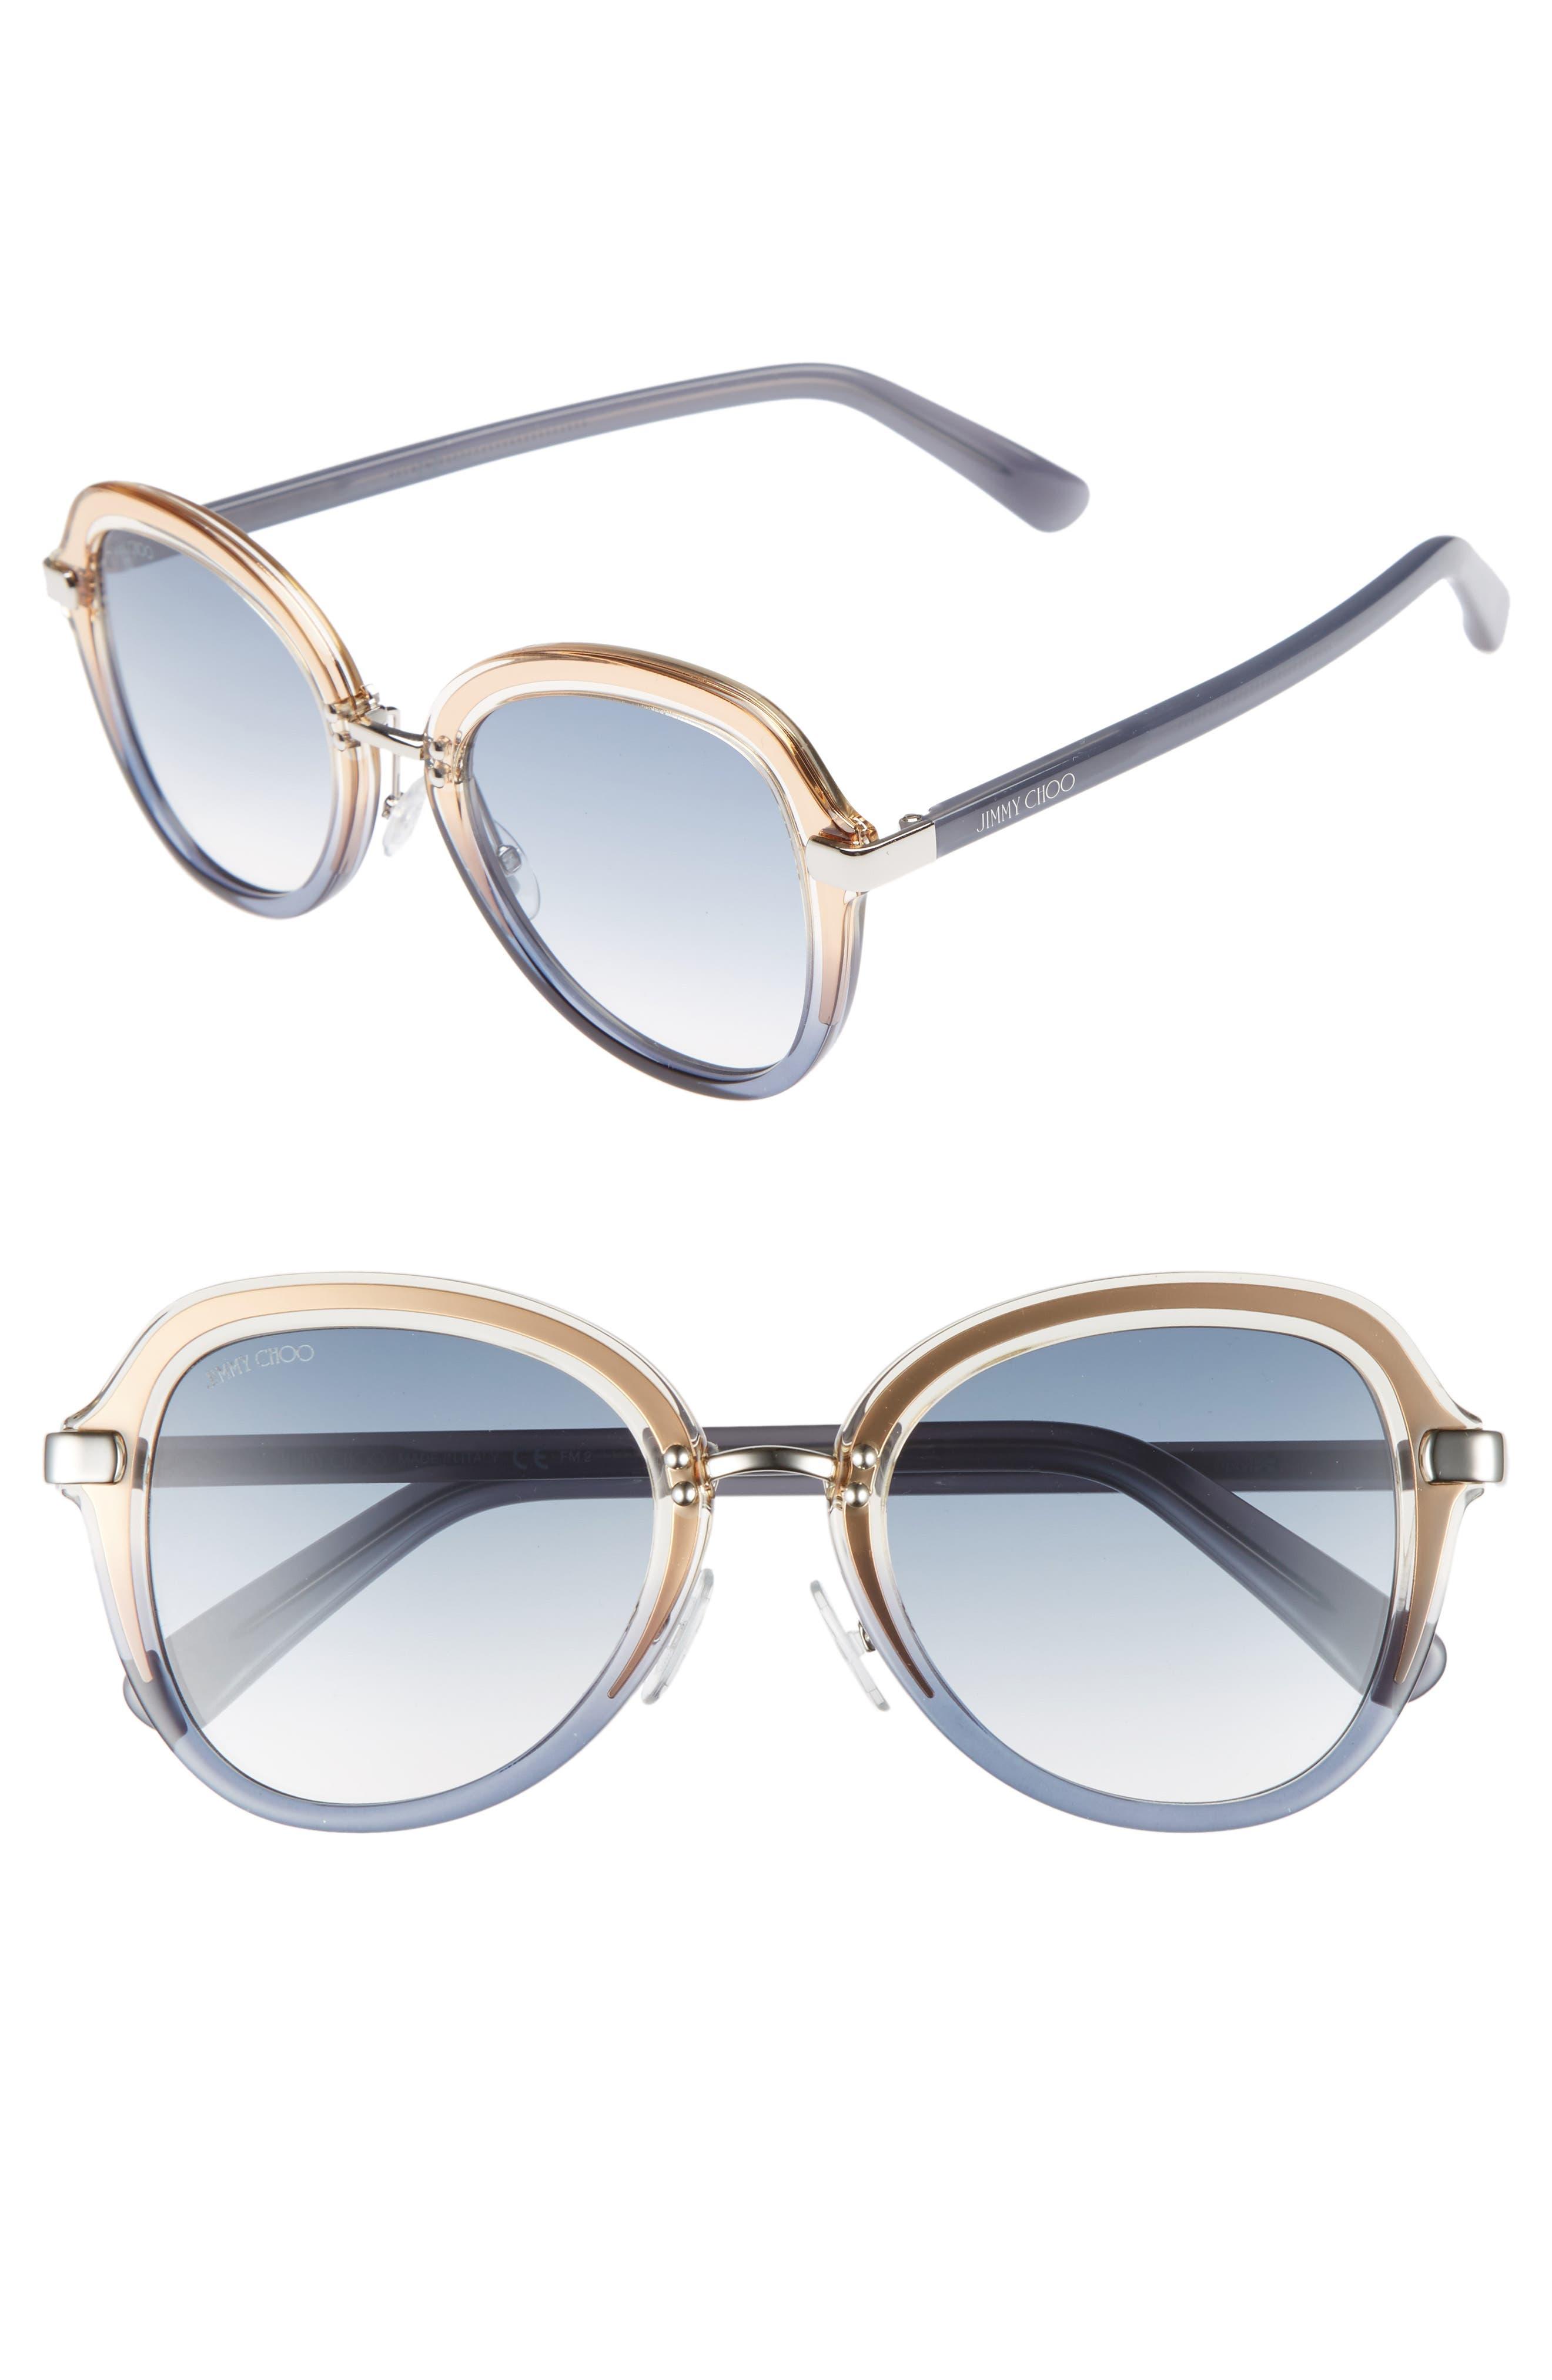 Drees 51mm Gradient Sunglasses,                         Main,                         color, 300